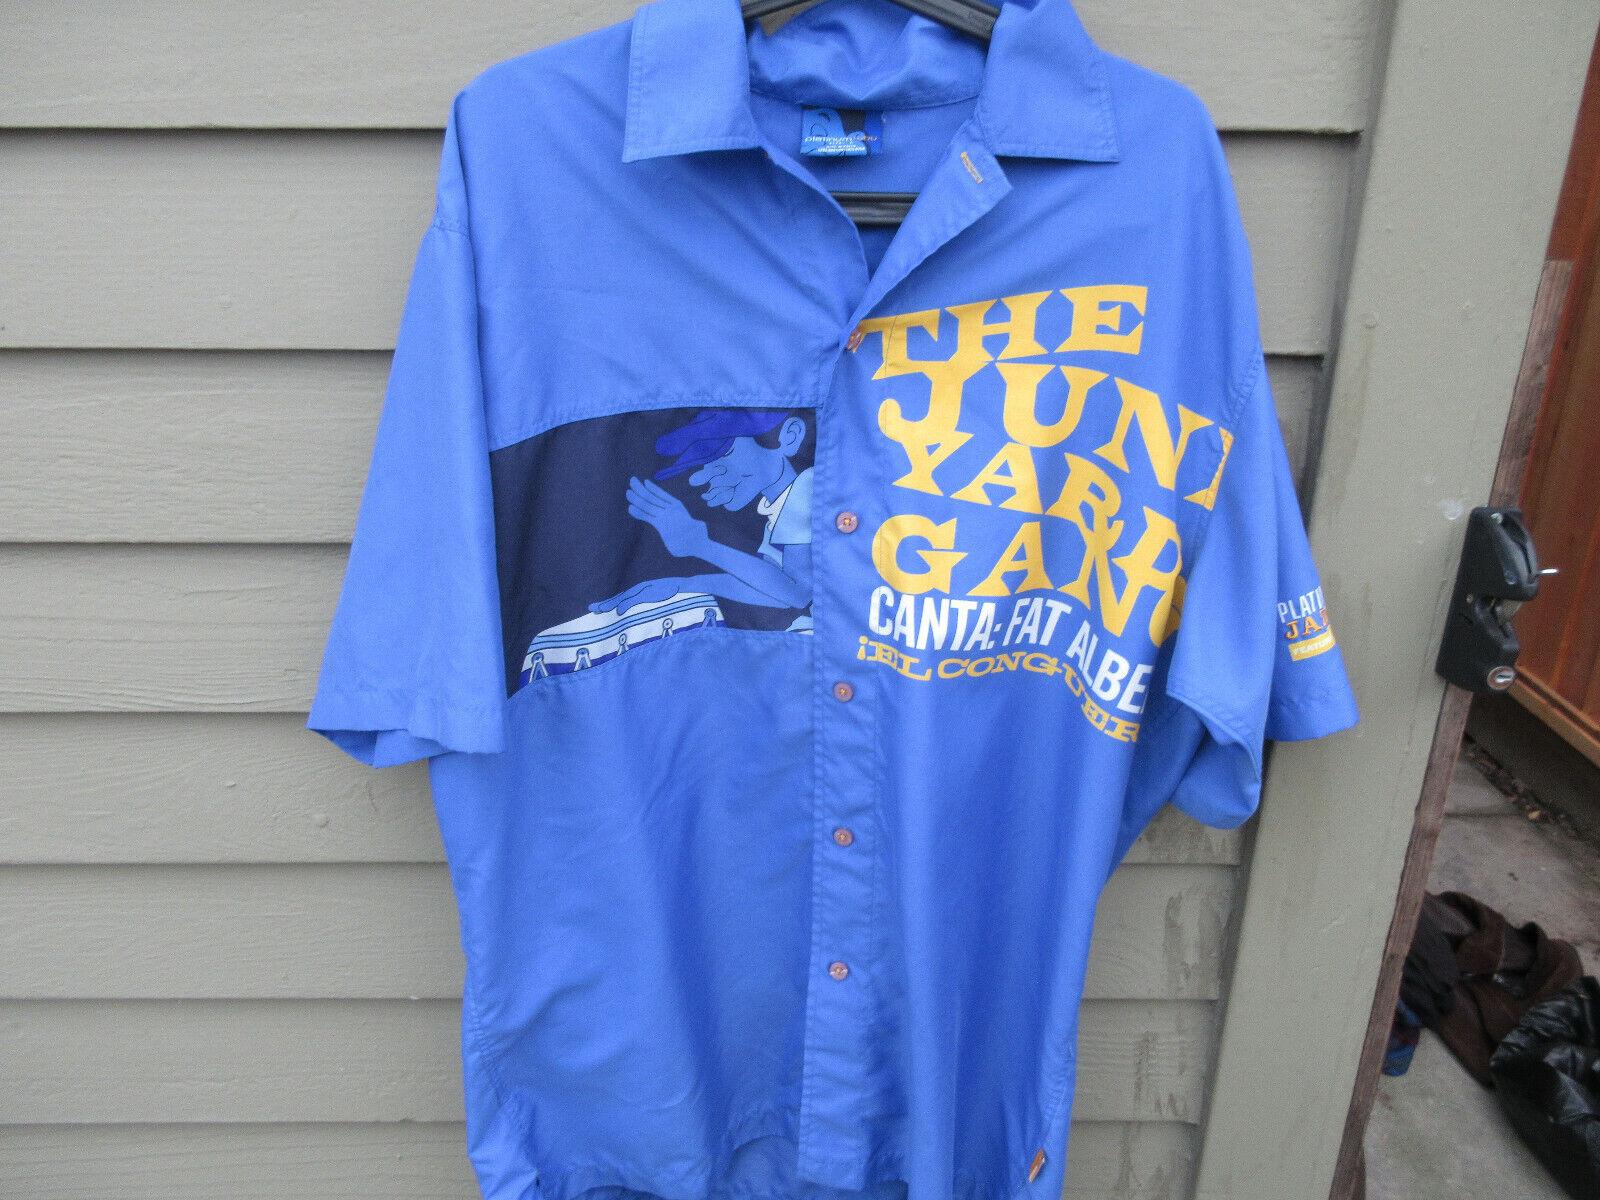 Fubu Platinum (Fat Albert) Junkyard Gang bluee Shirt Mens Size Large Jazz Series